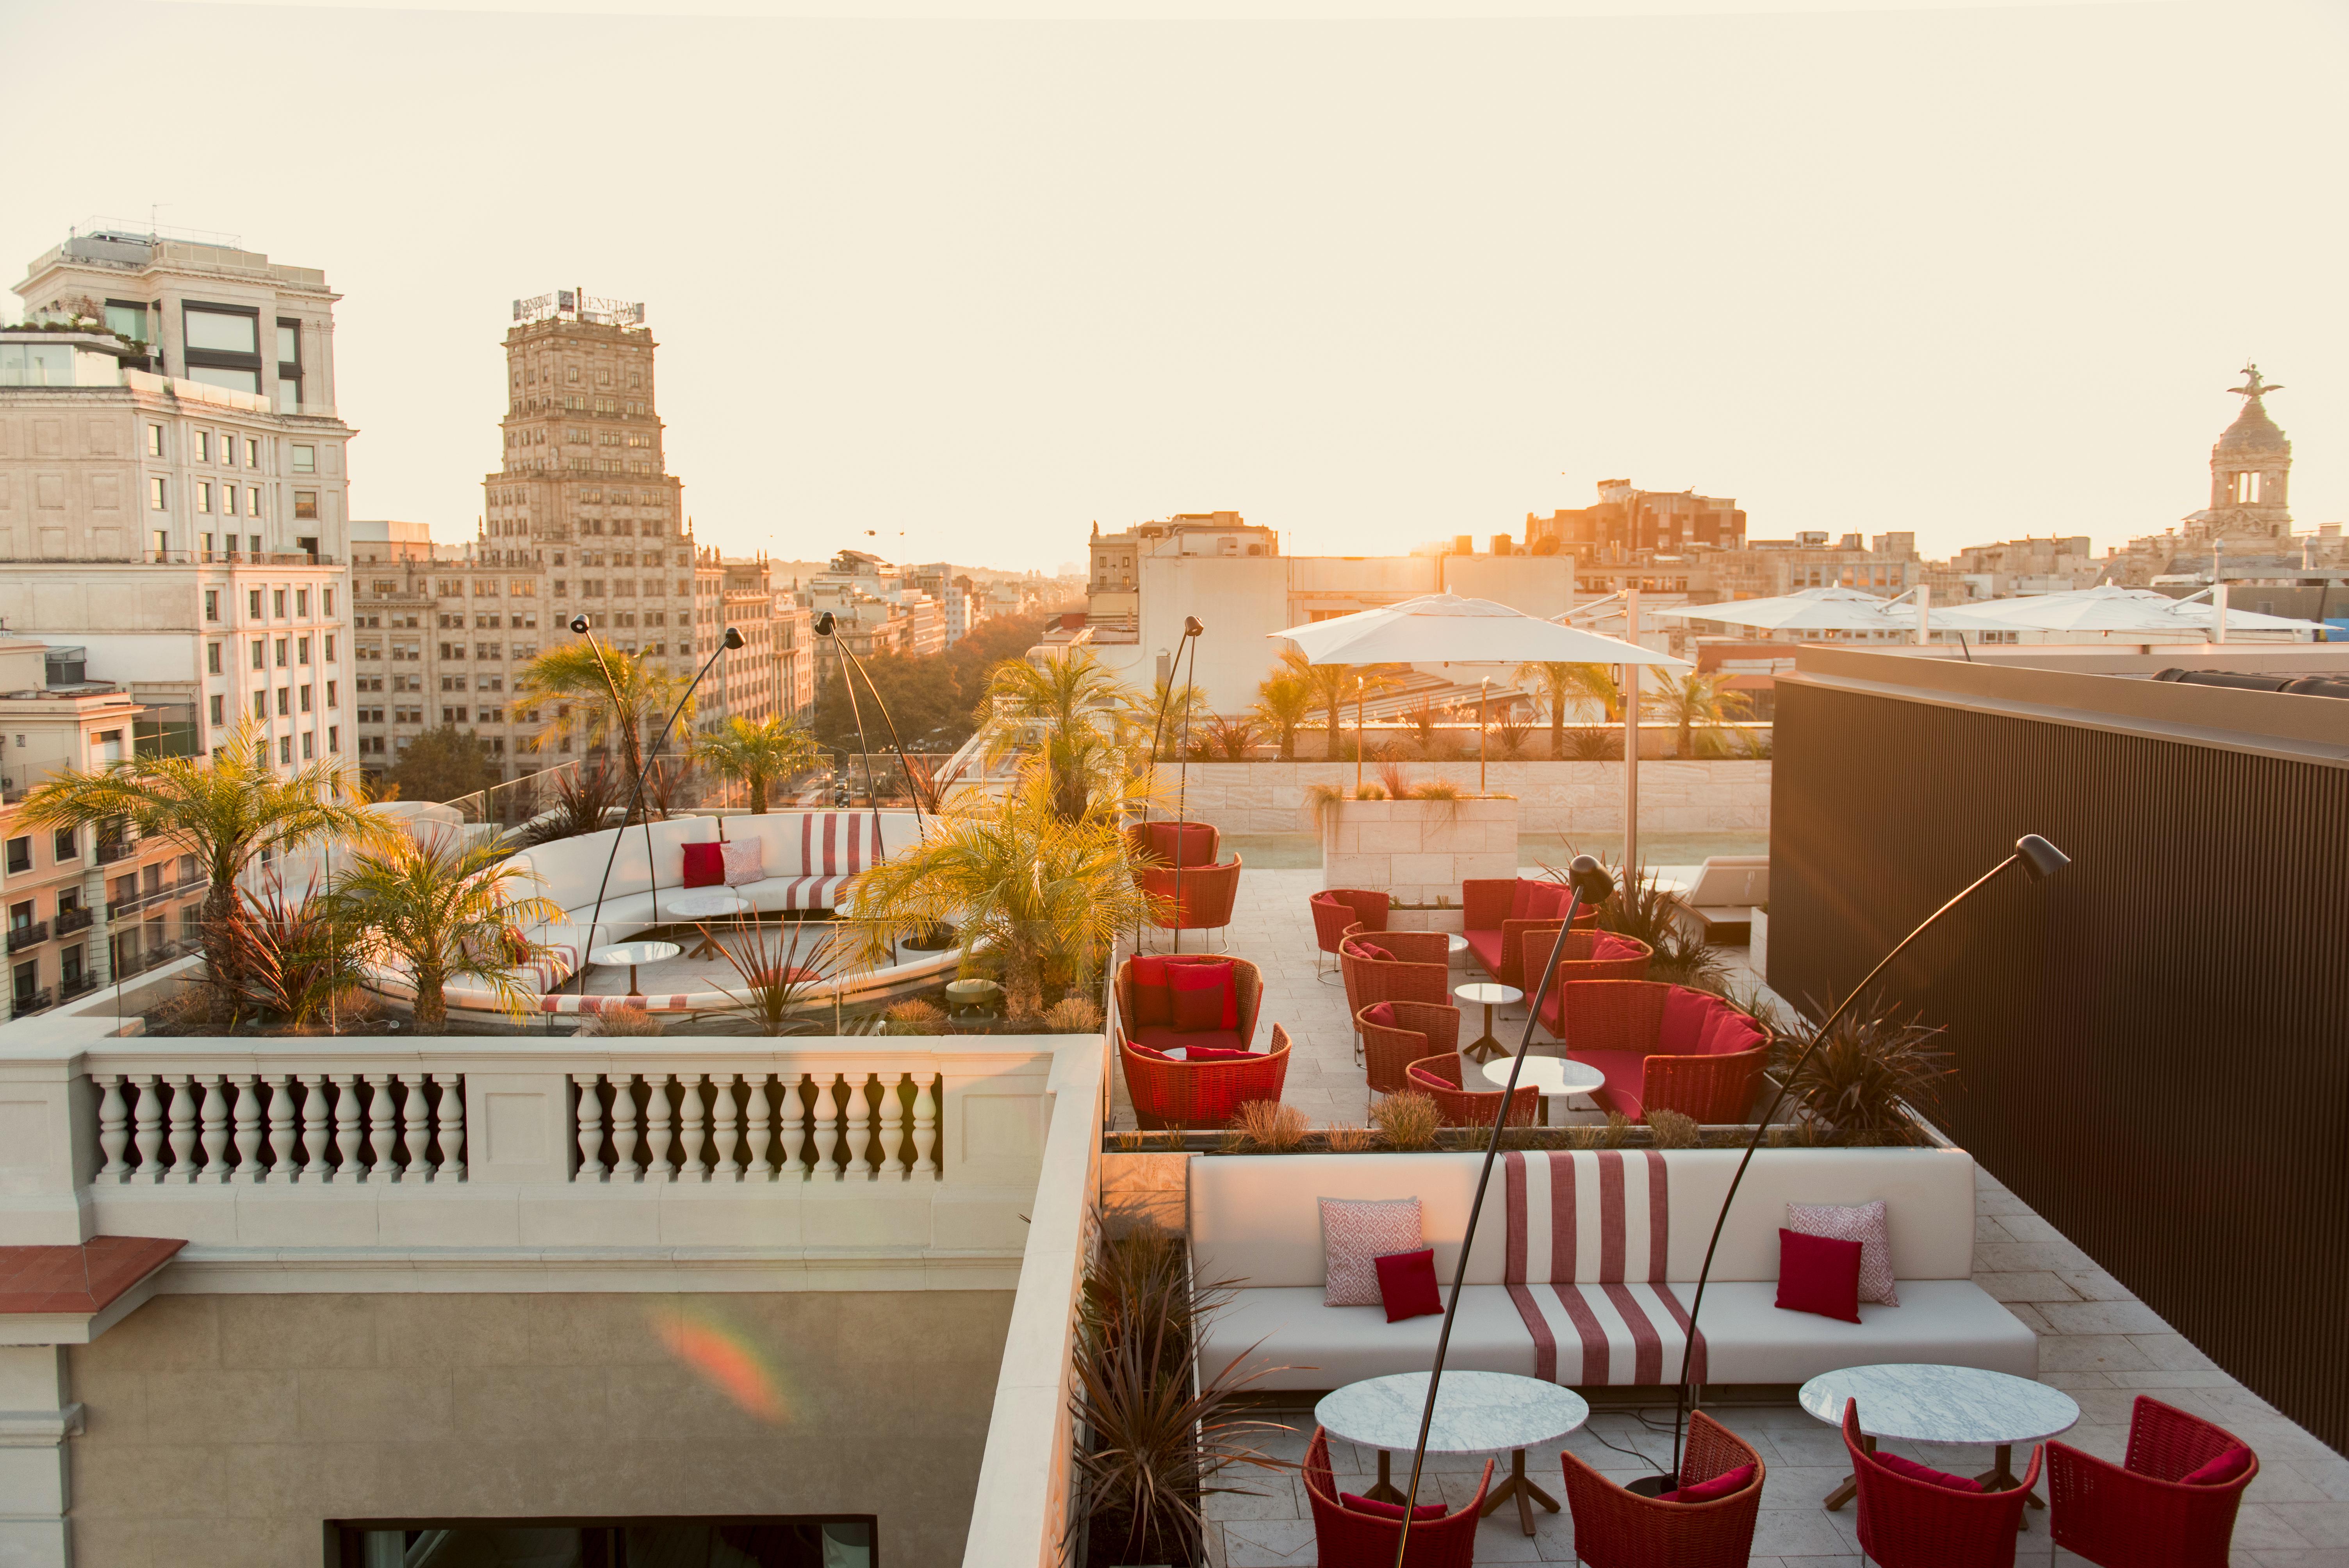 Pool and Rooftop Bar, Almanac Hotel, Barcelona